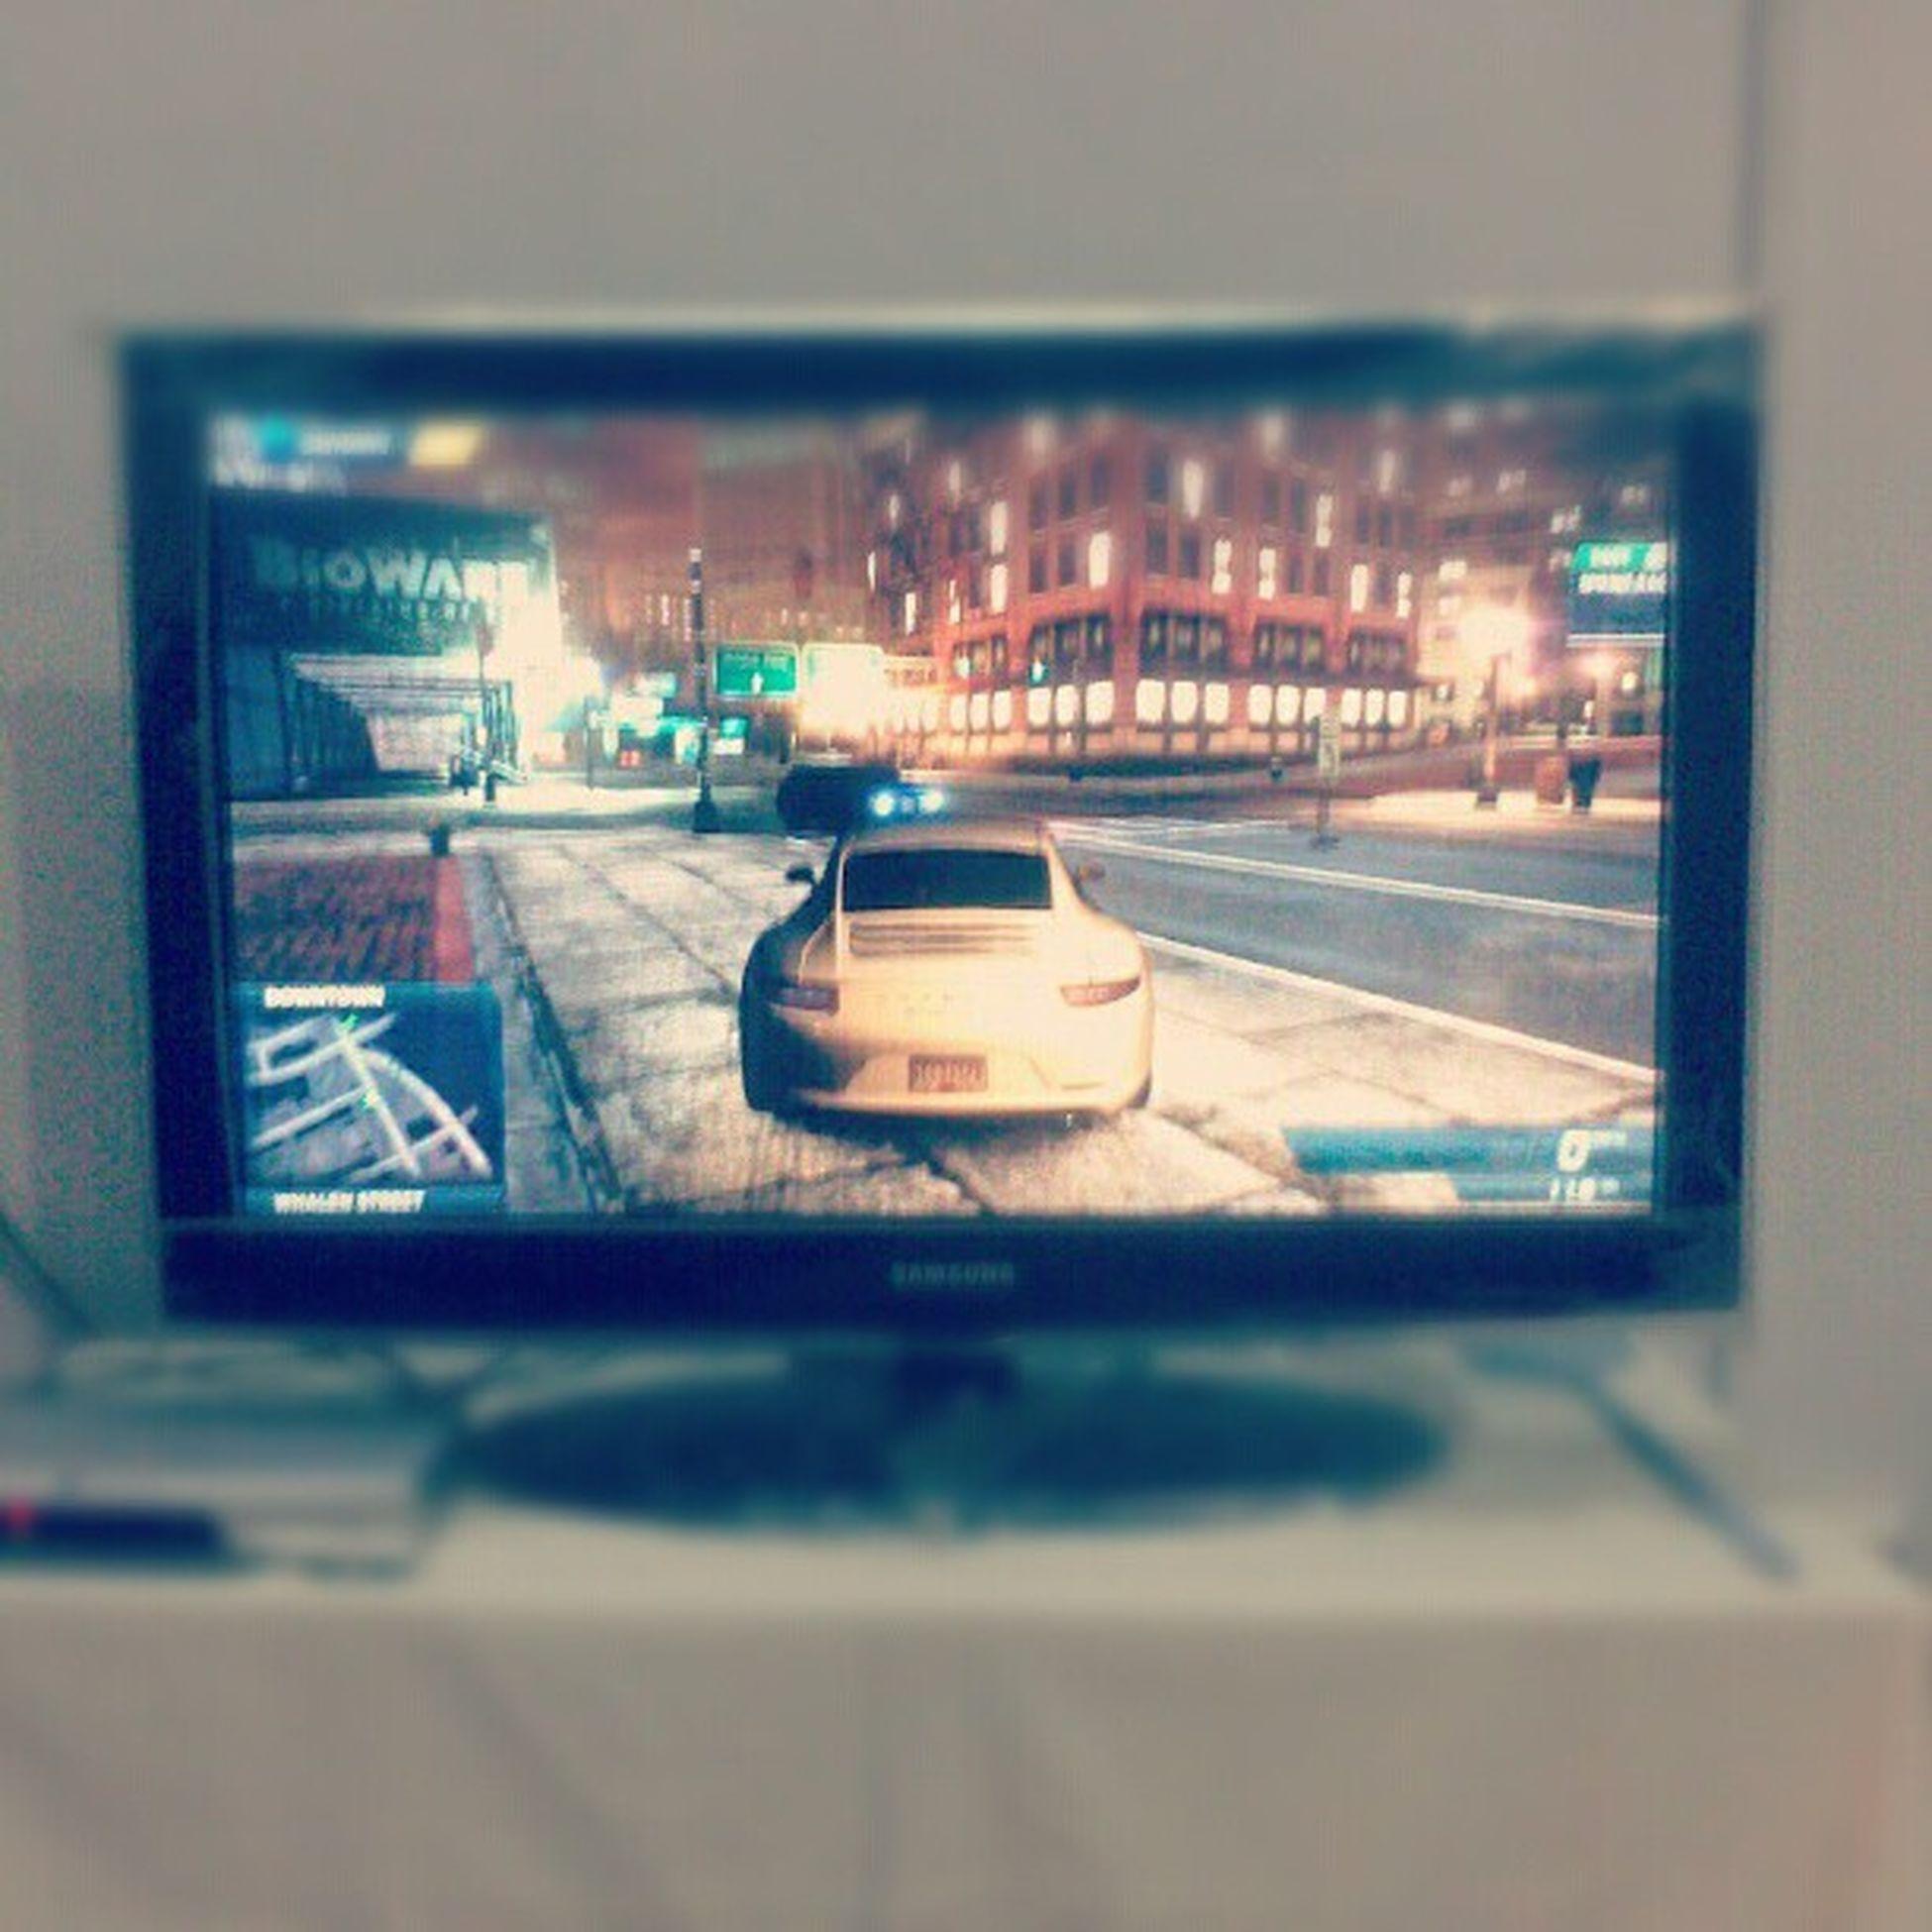 Needforspeedmostwanted Needforspeed NFS Game gammer 2012 race porsche instapakistan samsung Lcdtv fun Car gameplay